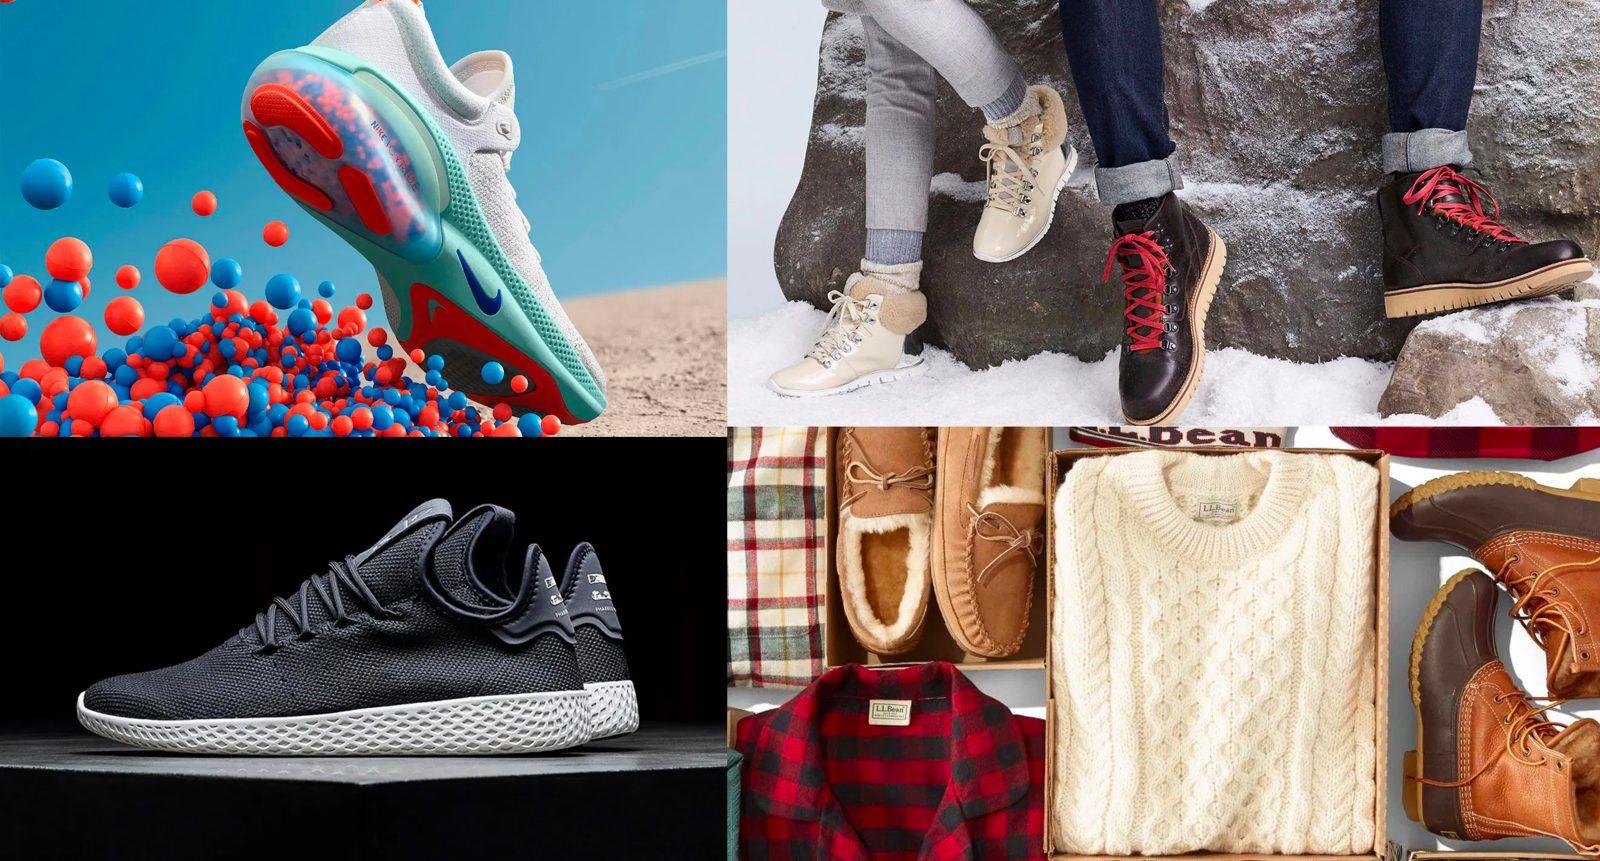 Cyber Monday Fashion Deals 2019: Nike, adidas, Nordstrom, Lululemon, more